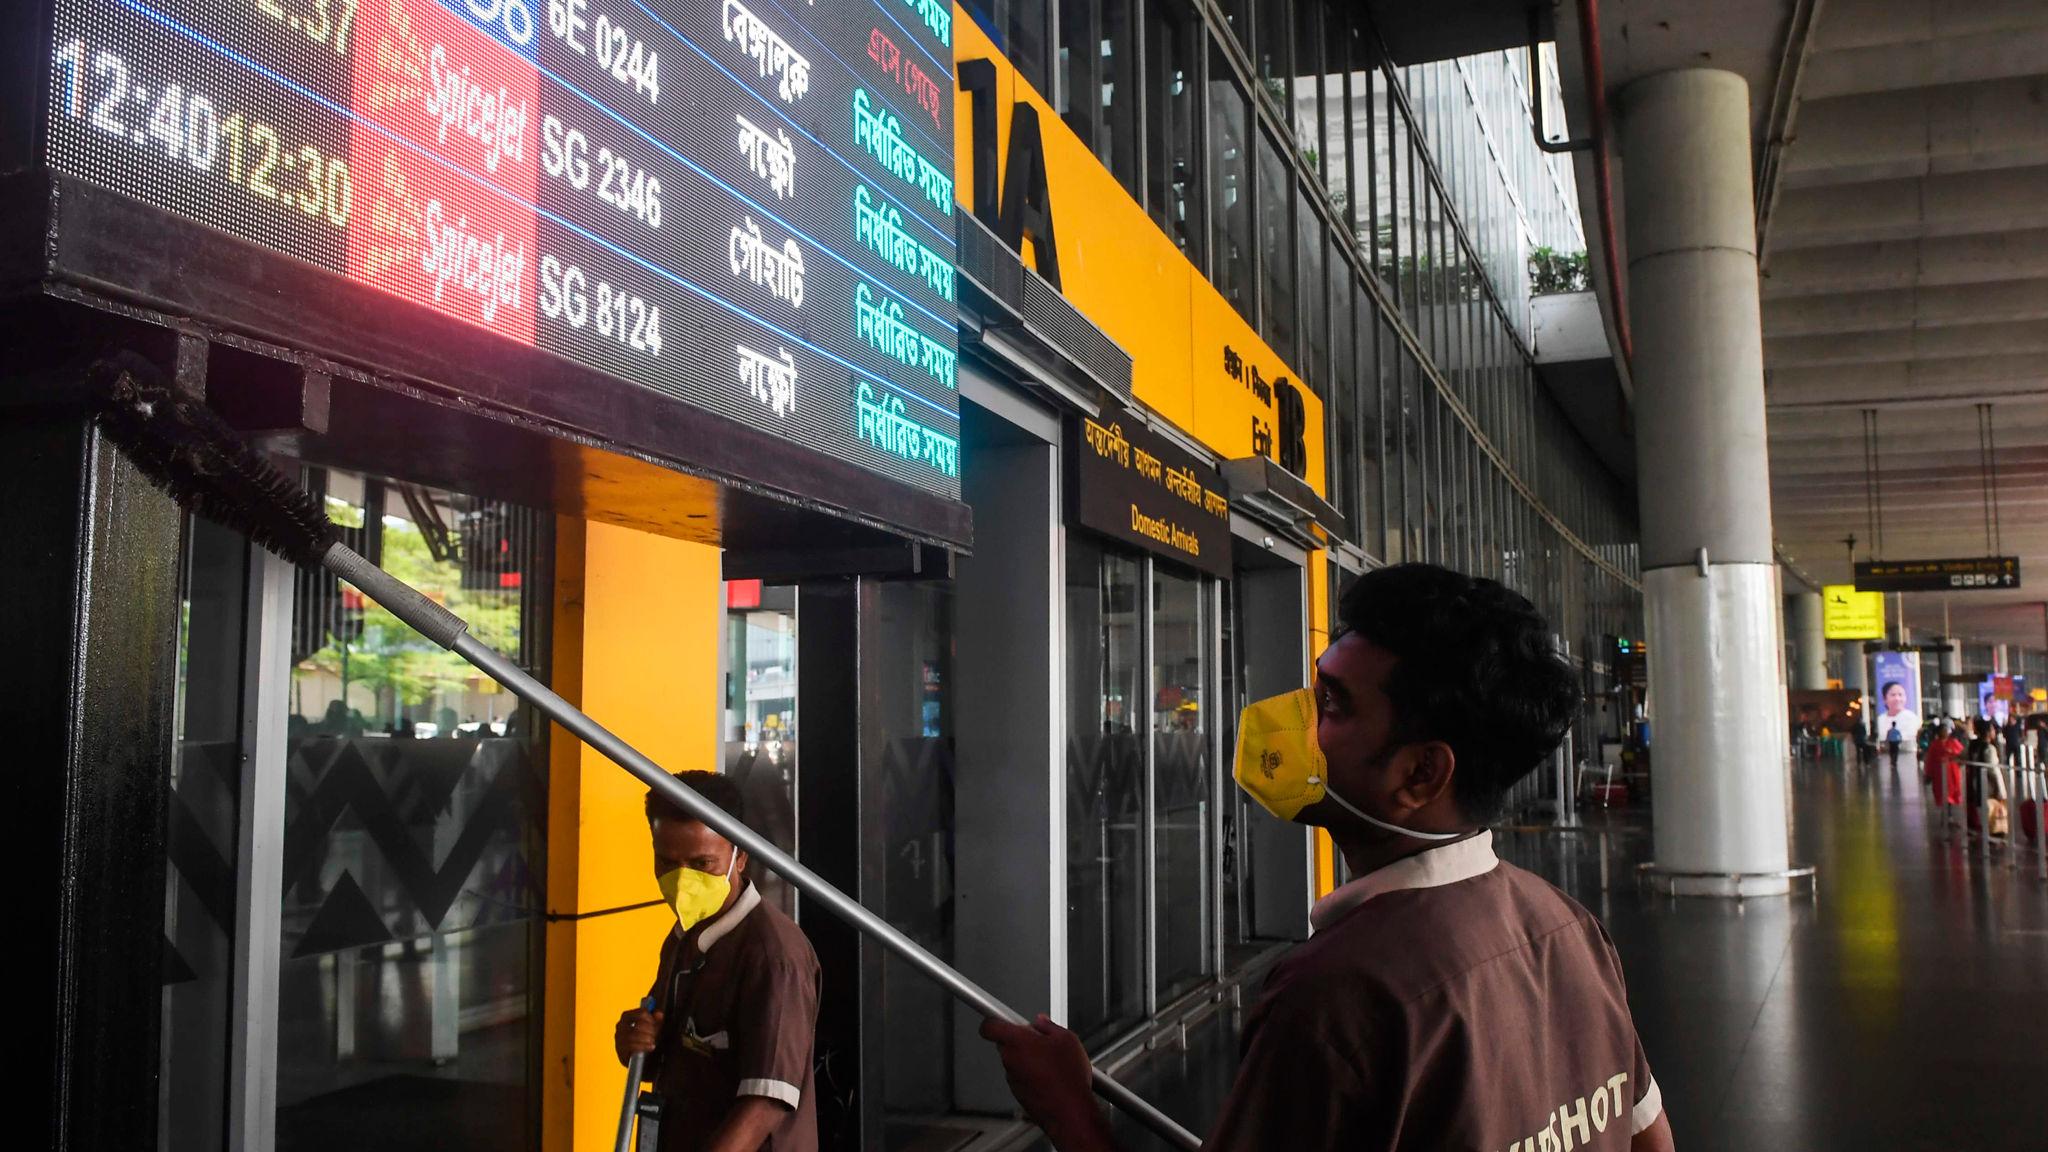 Coronavirus: Boeing stock down 25% as credit rating cut – as it happened |  Financial Times